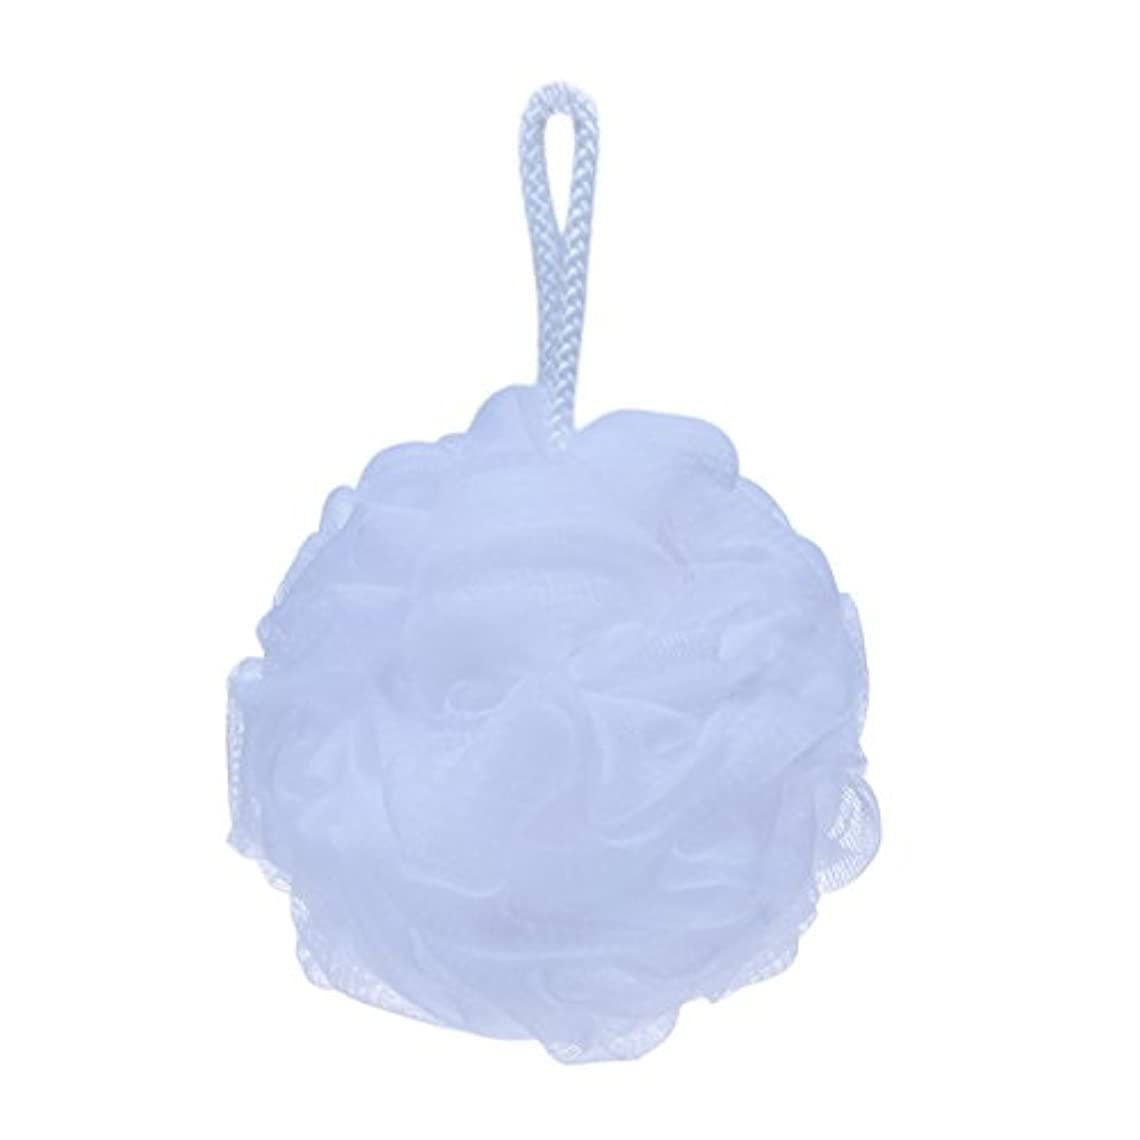 SUPERMOOM バスボール 泡立てネット ボール シャワー ナイロン 4種類の色選択